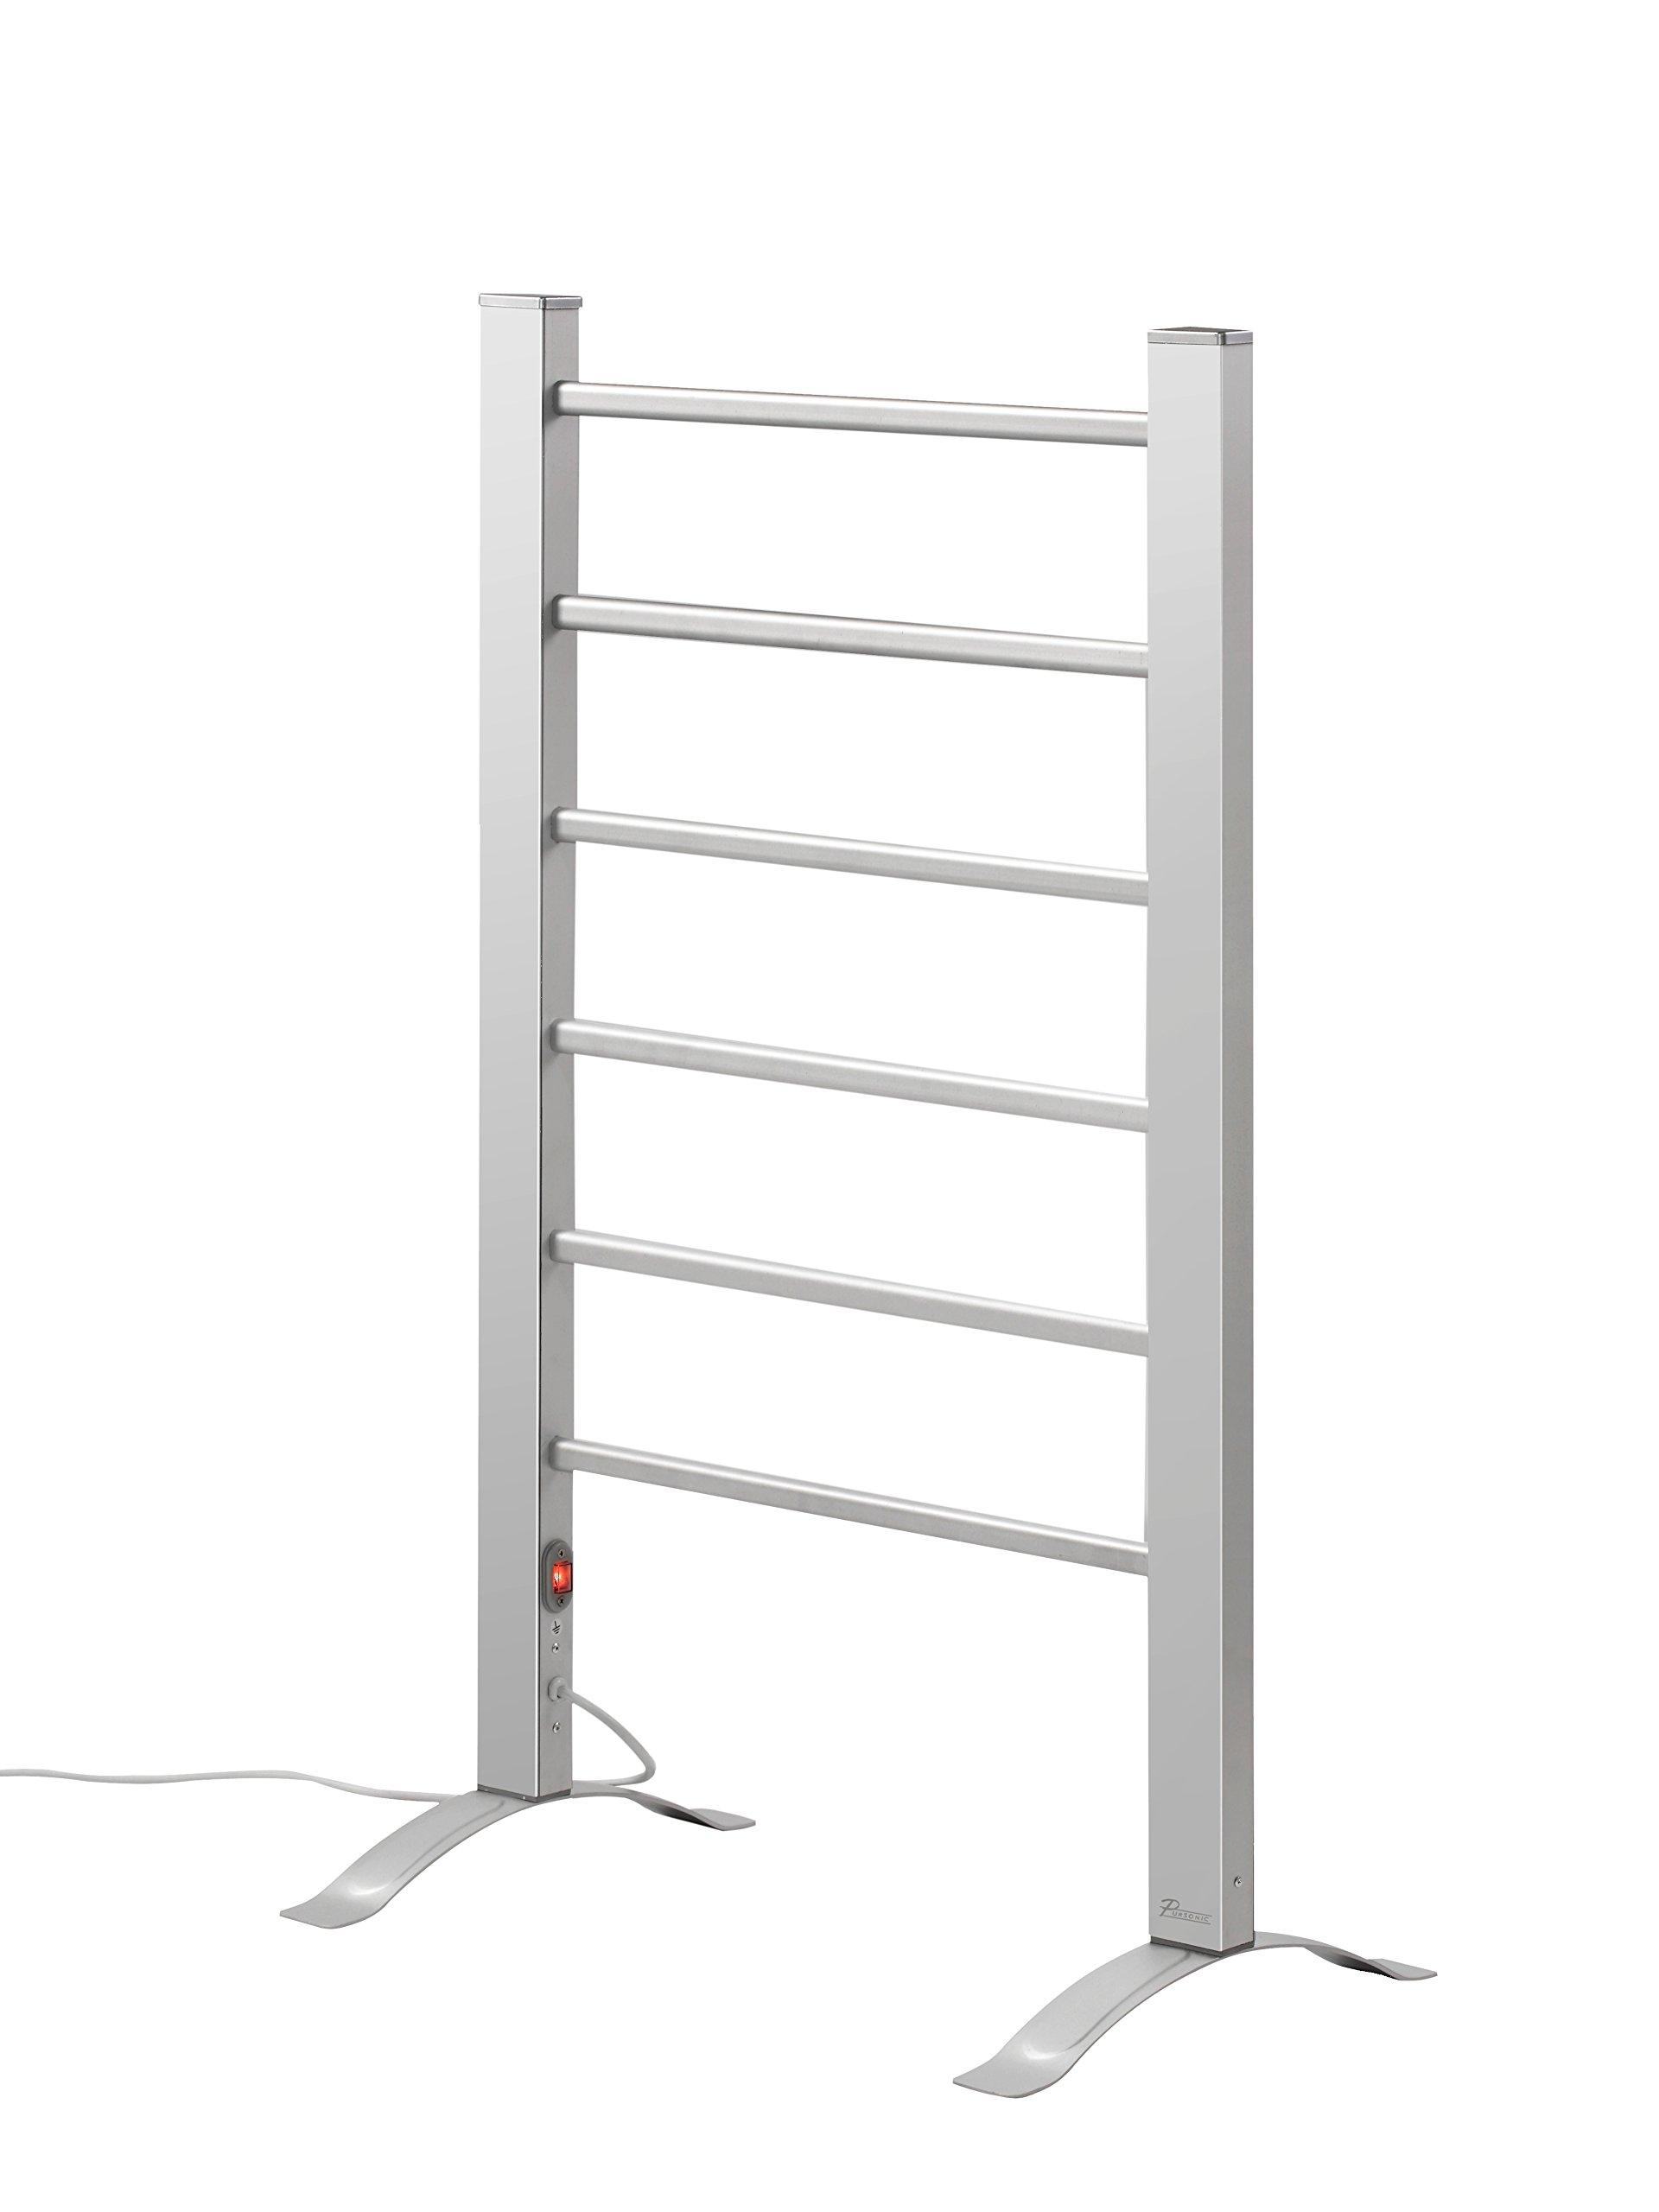 Pursonic TW300 6-Bar Freestanding or Wall Mountable Towel Warmer